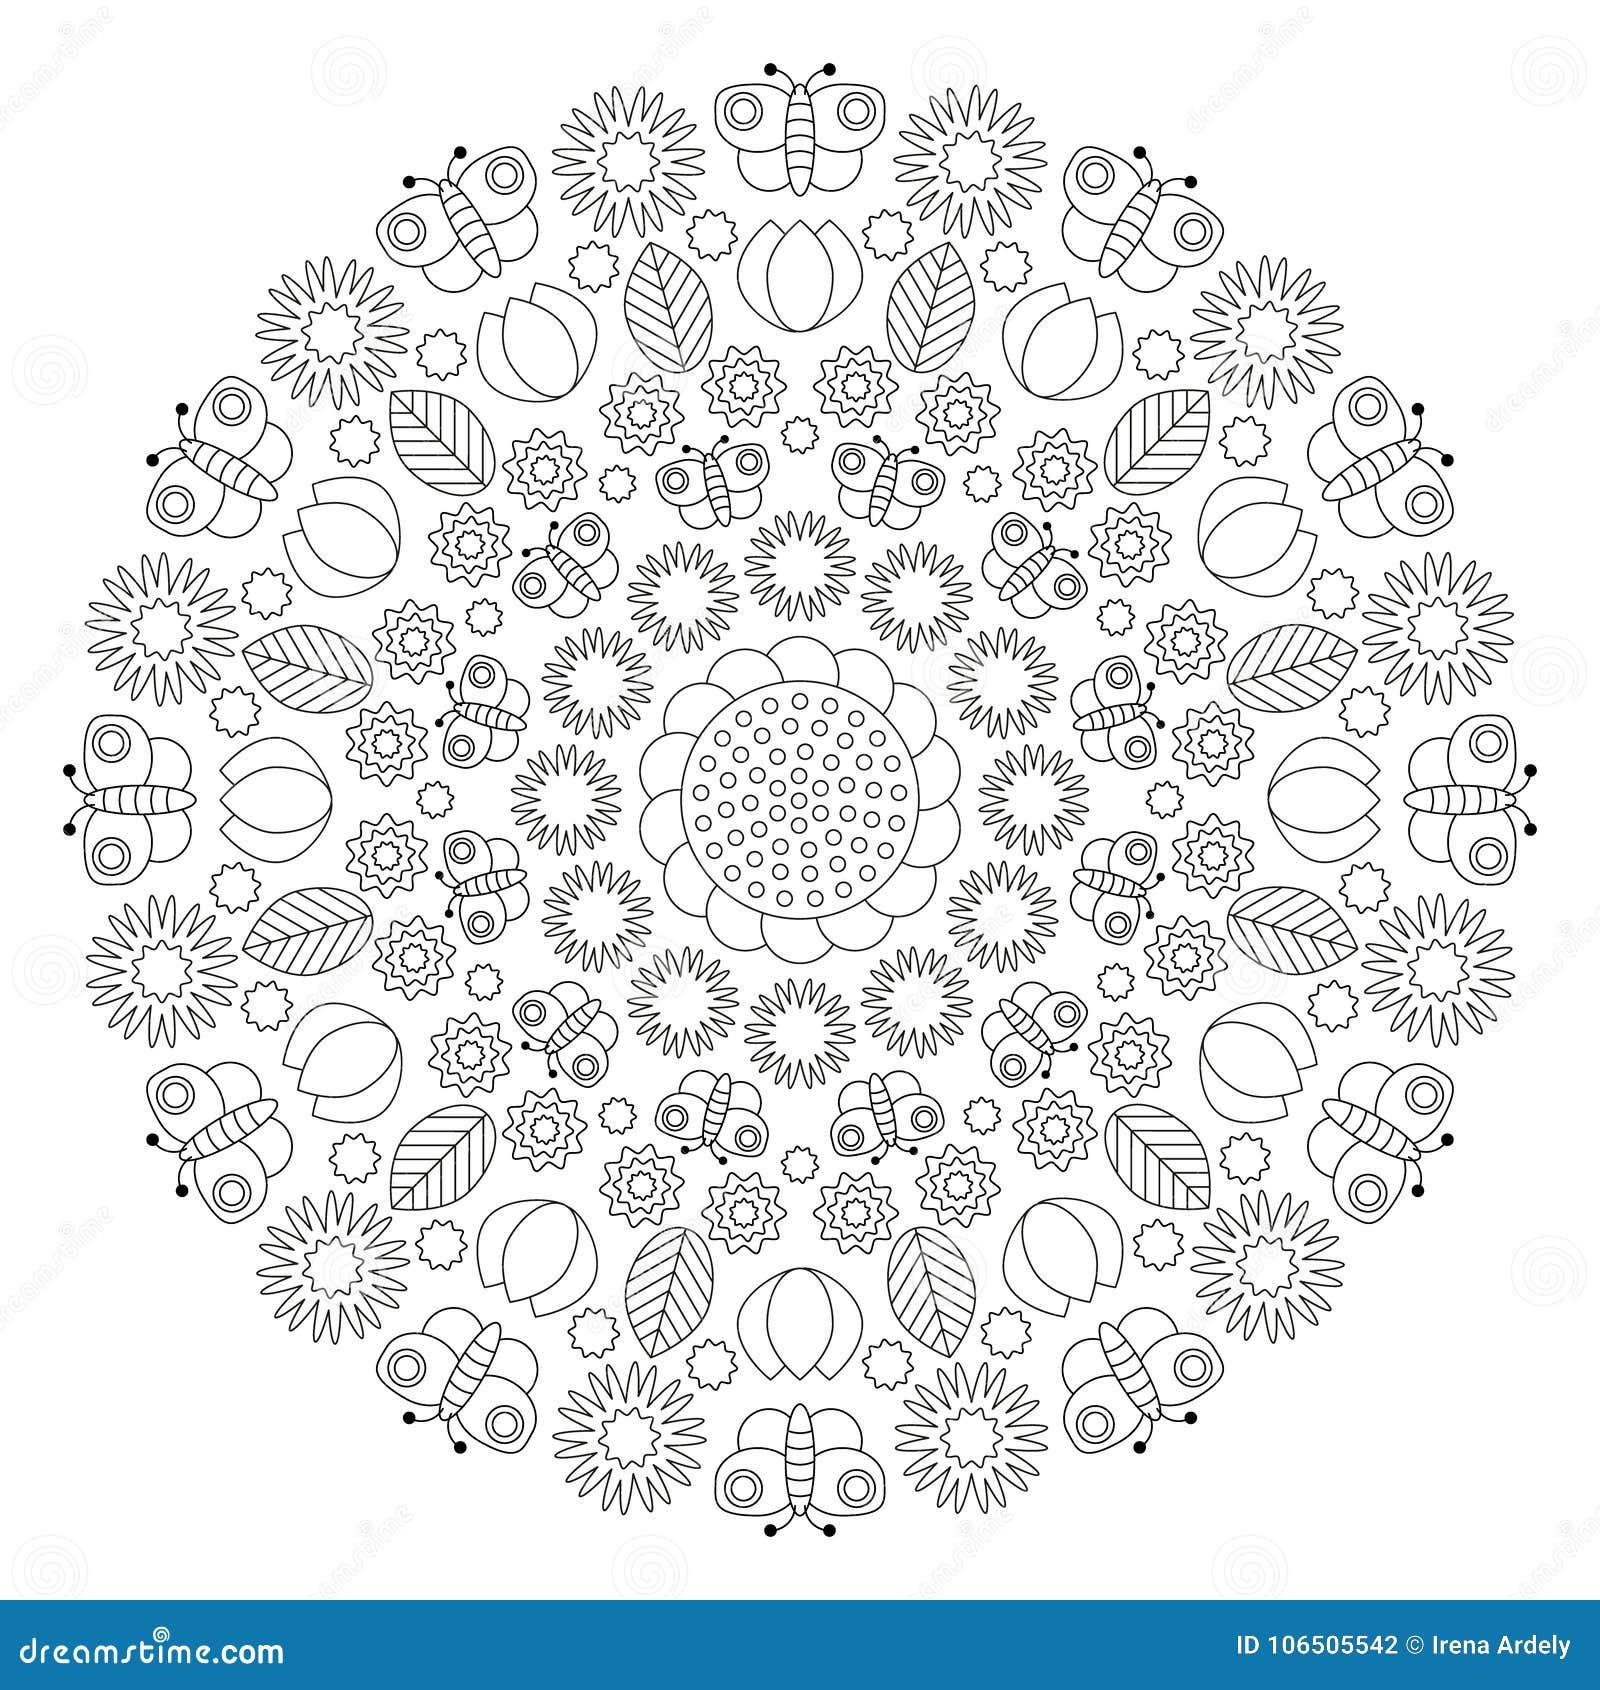 Vector Schwarzweiss Frühlingsmandala Mit Schmetterlingen Blumen